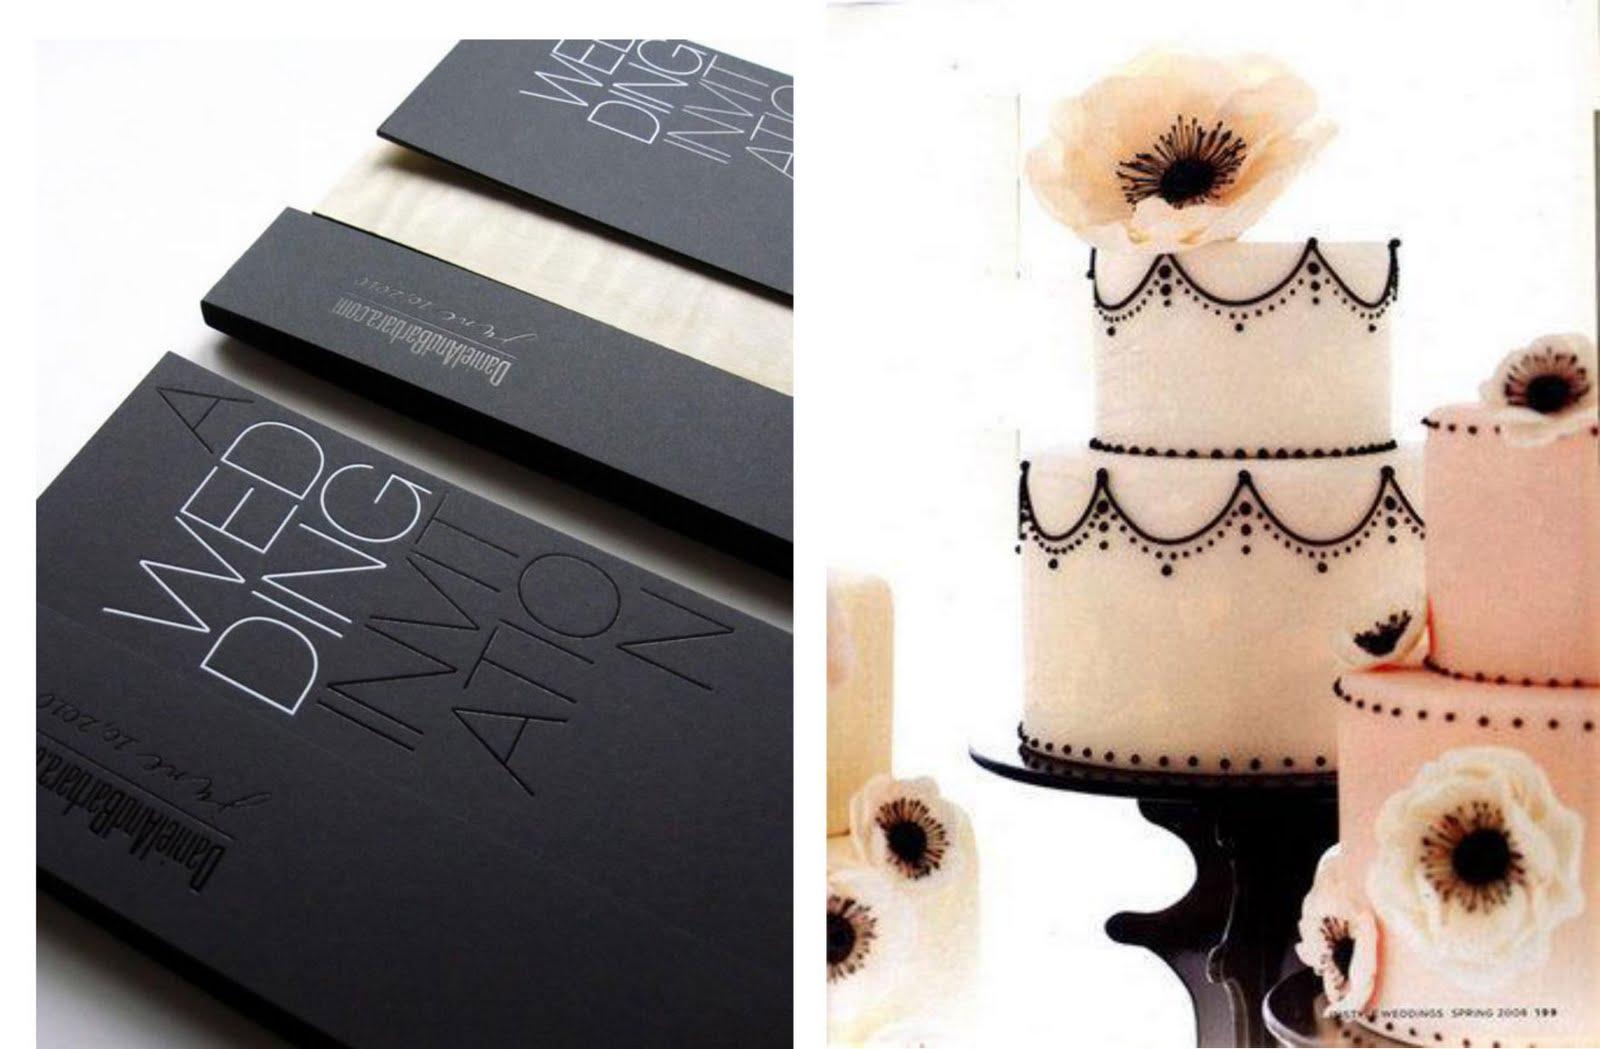 Peach Black Invitations Landlock Bride Cake Wedding Bee: Black And Peach Wedding Invitations At Websimilar.org